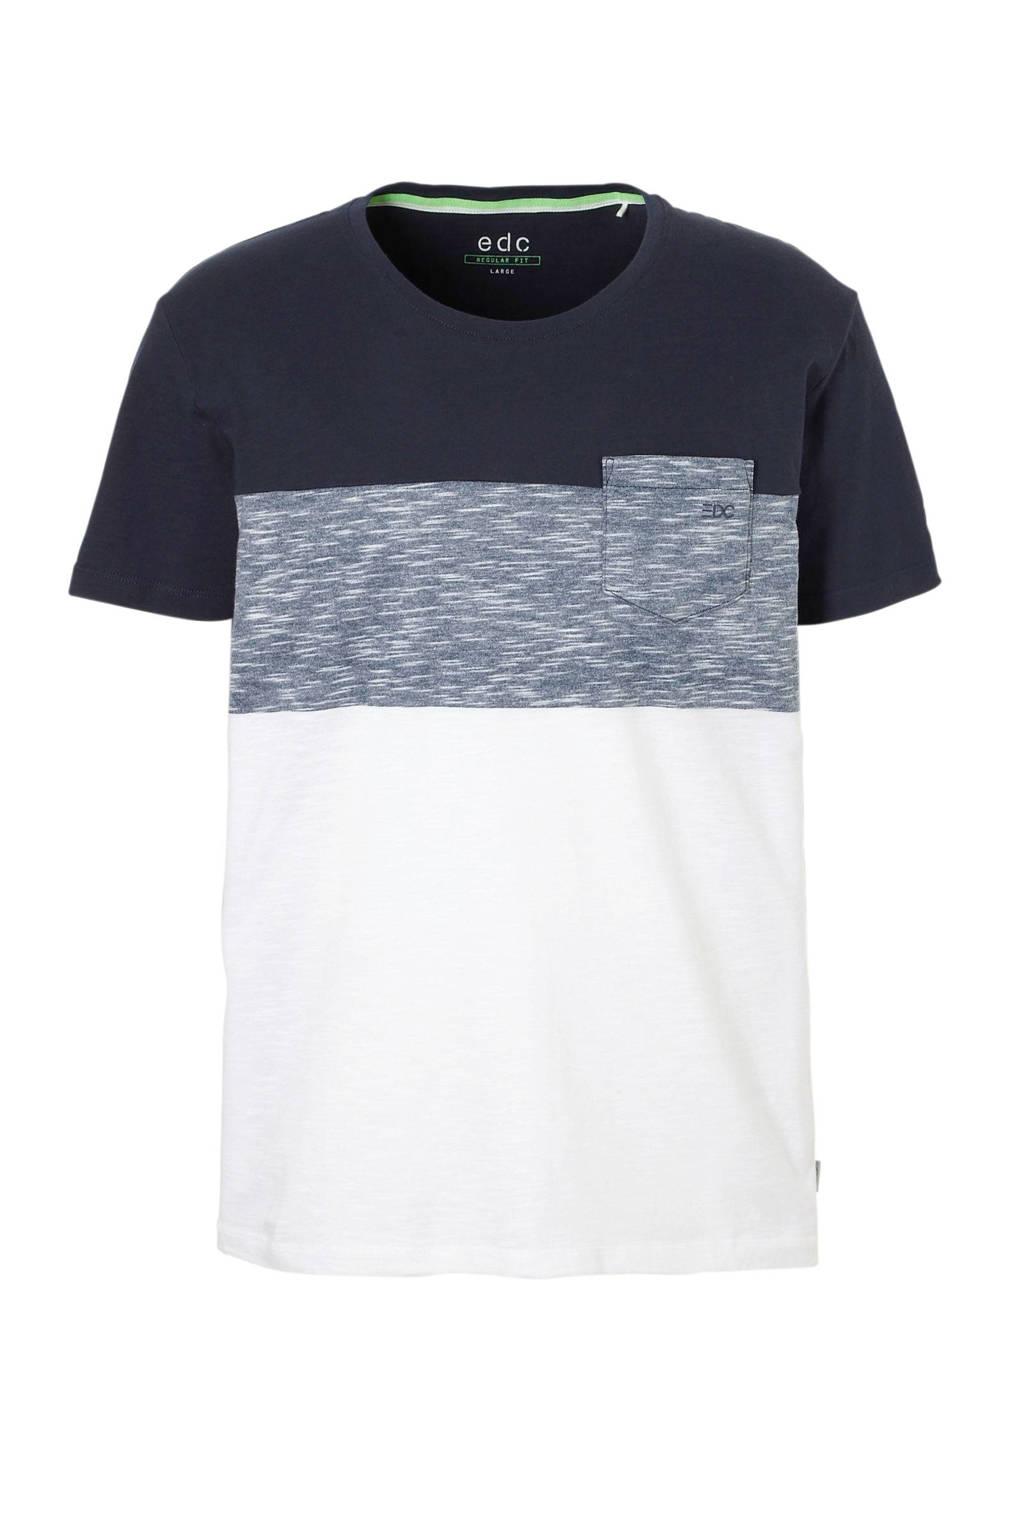 edc Men T-shirt, Donkerblauw/wit